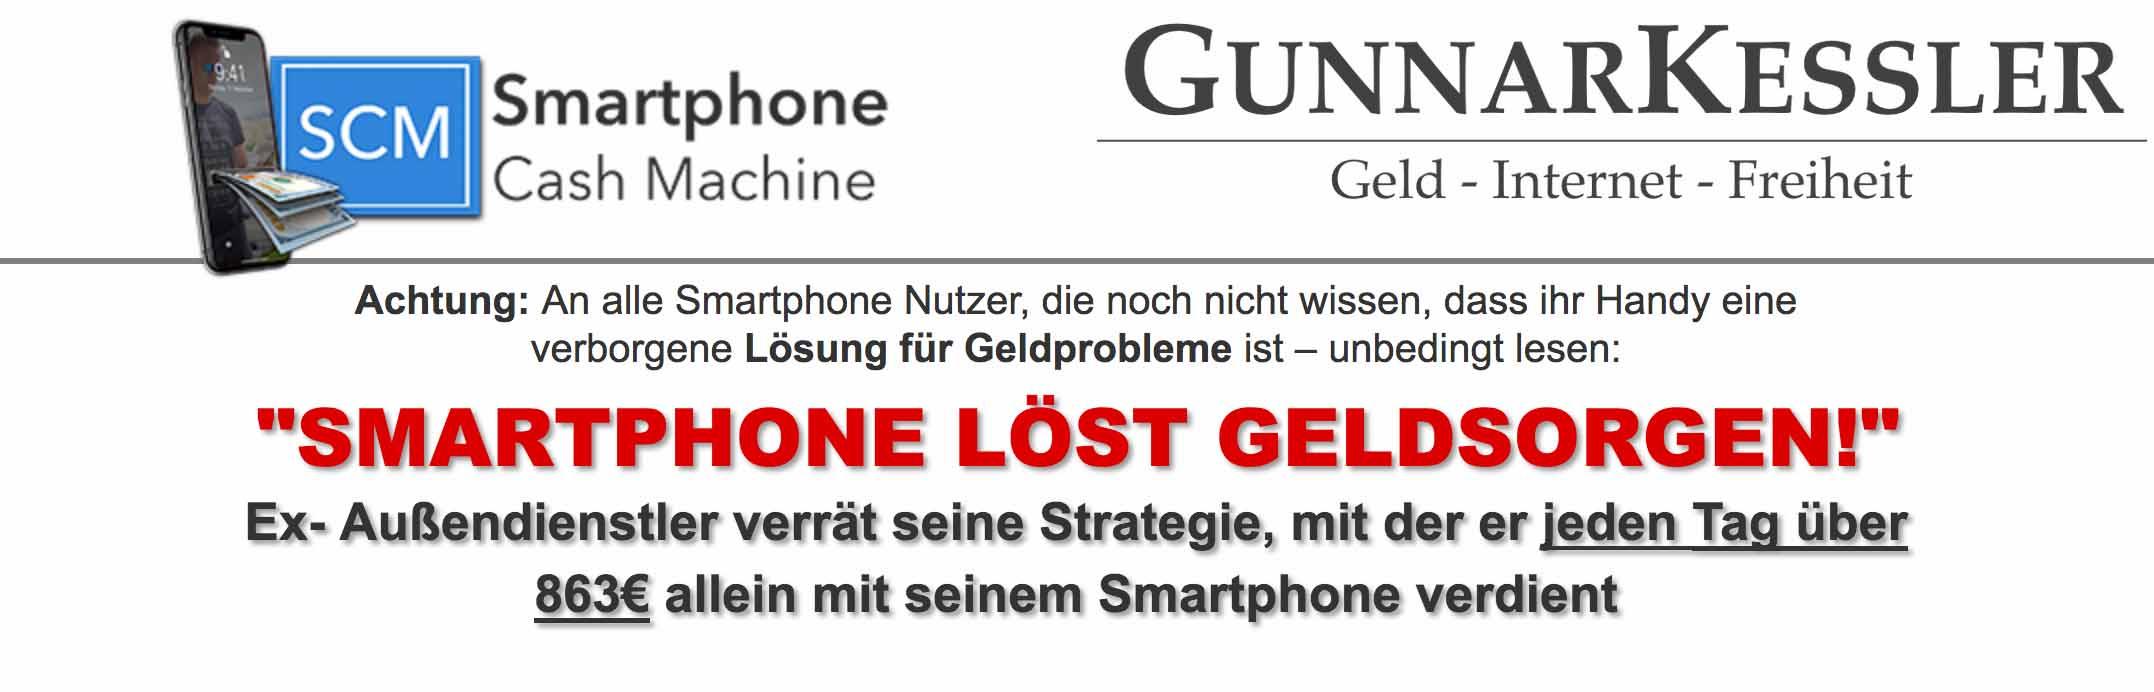 Gunnar Kessler Smartphone Cash Machine